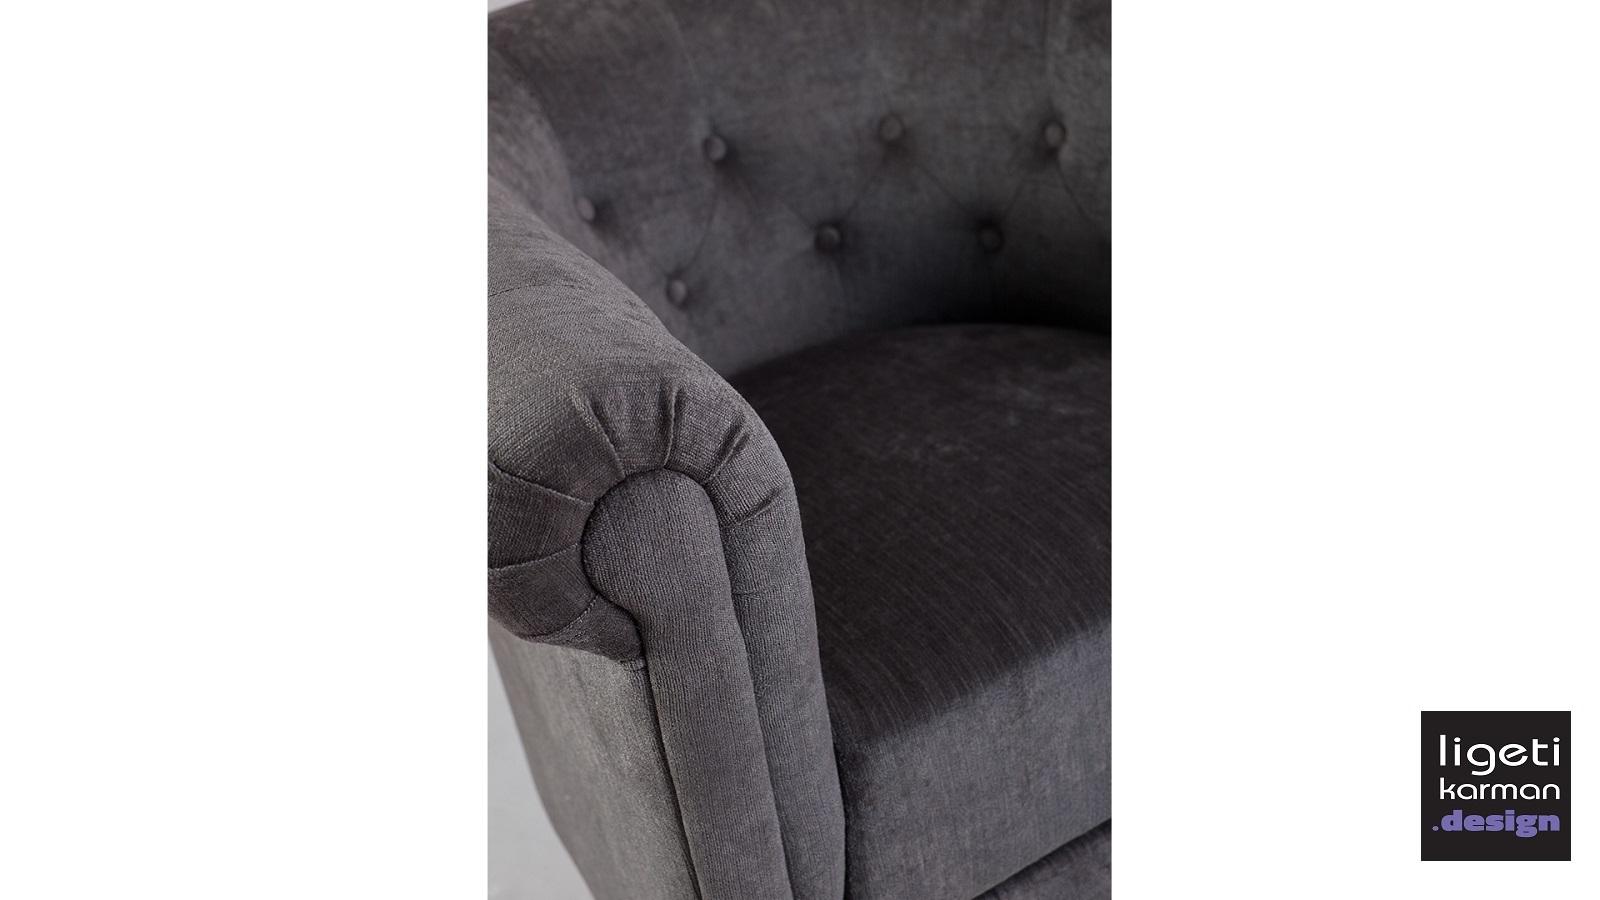 miotto_Pitto grey detail